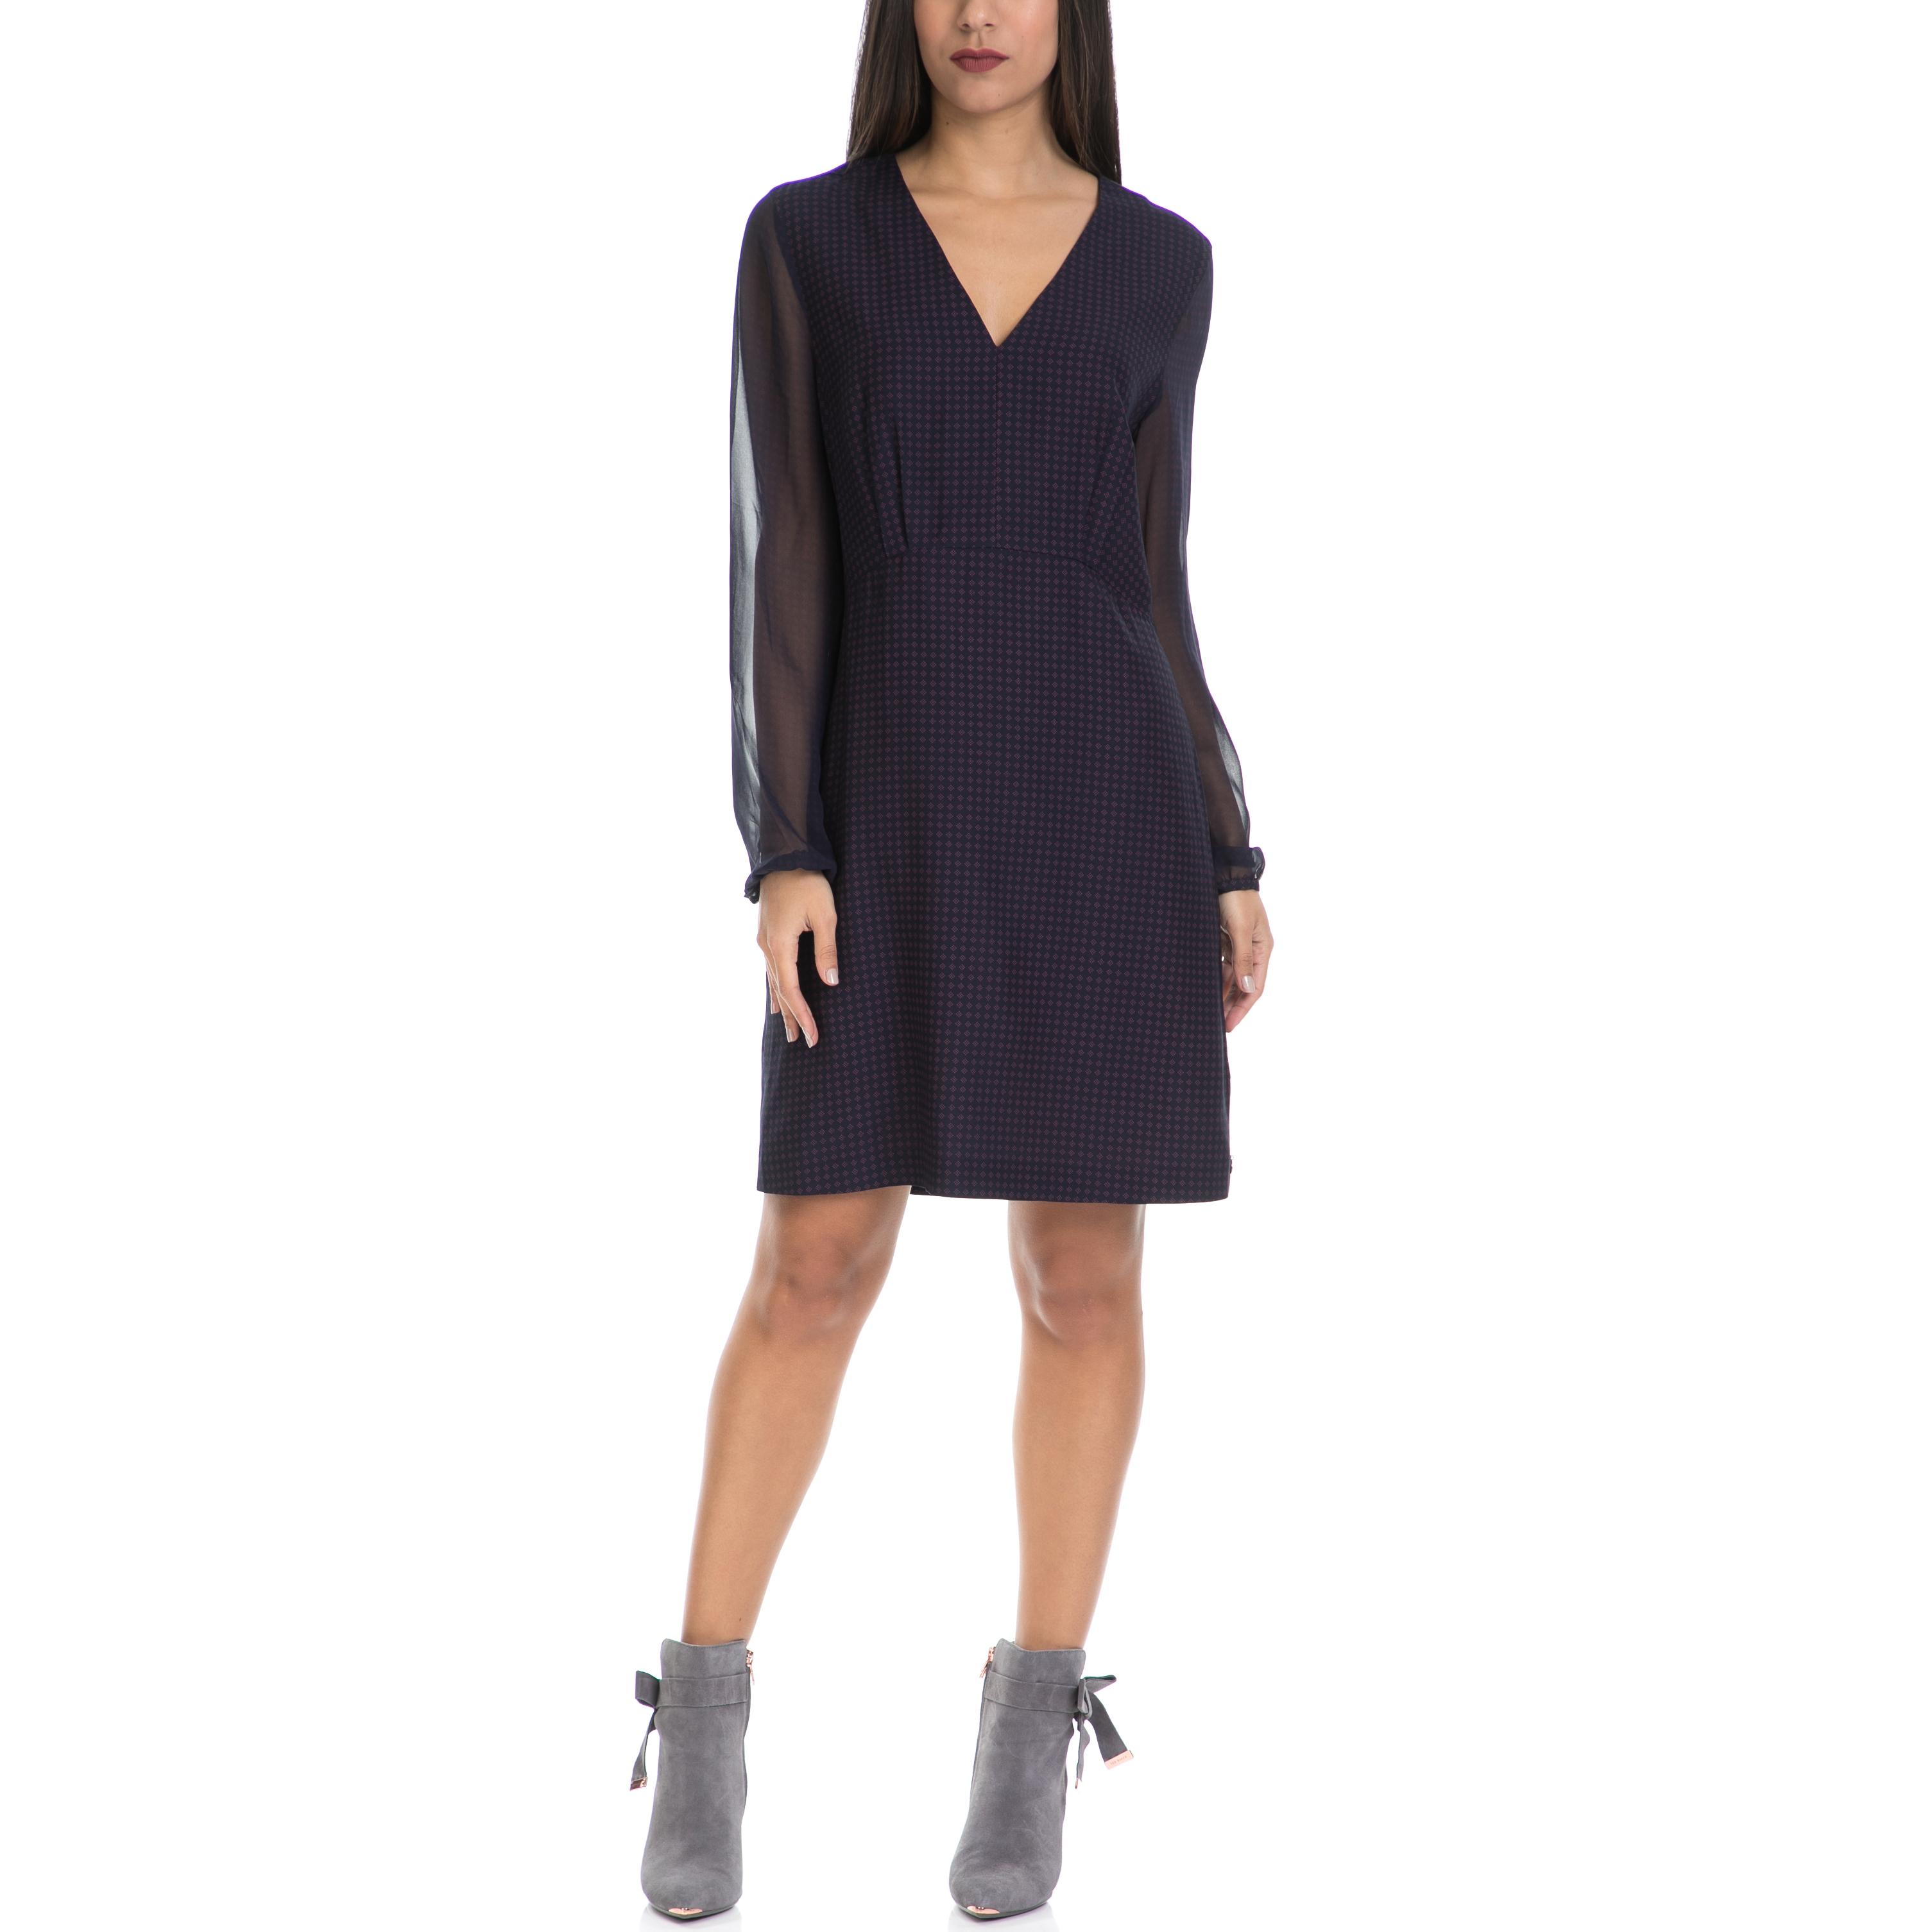 MAISON SCOTCH - Γυναικείο φόρεμα MAISON SCOTCH μπλε γυναικεία ρούχα φορέματα μίνι